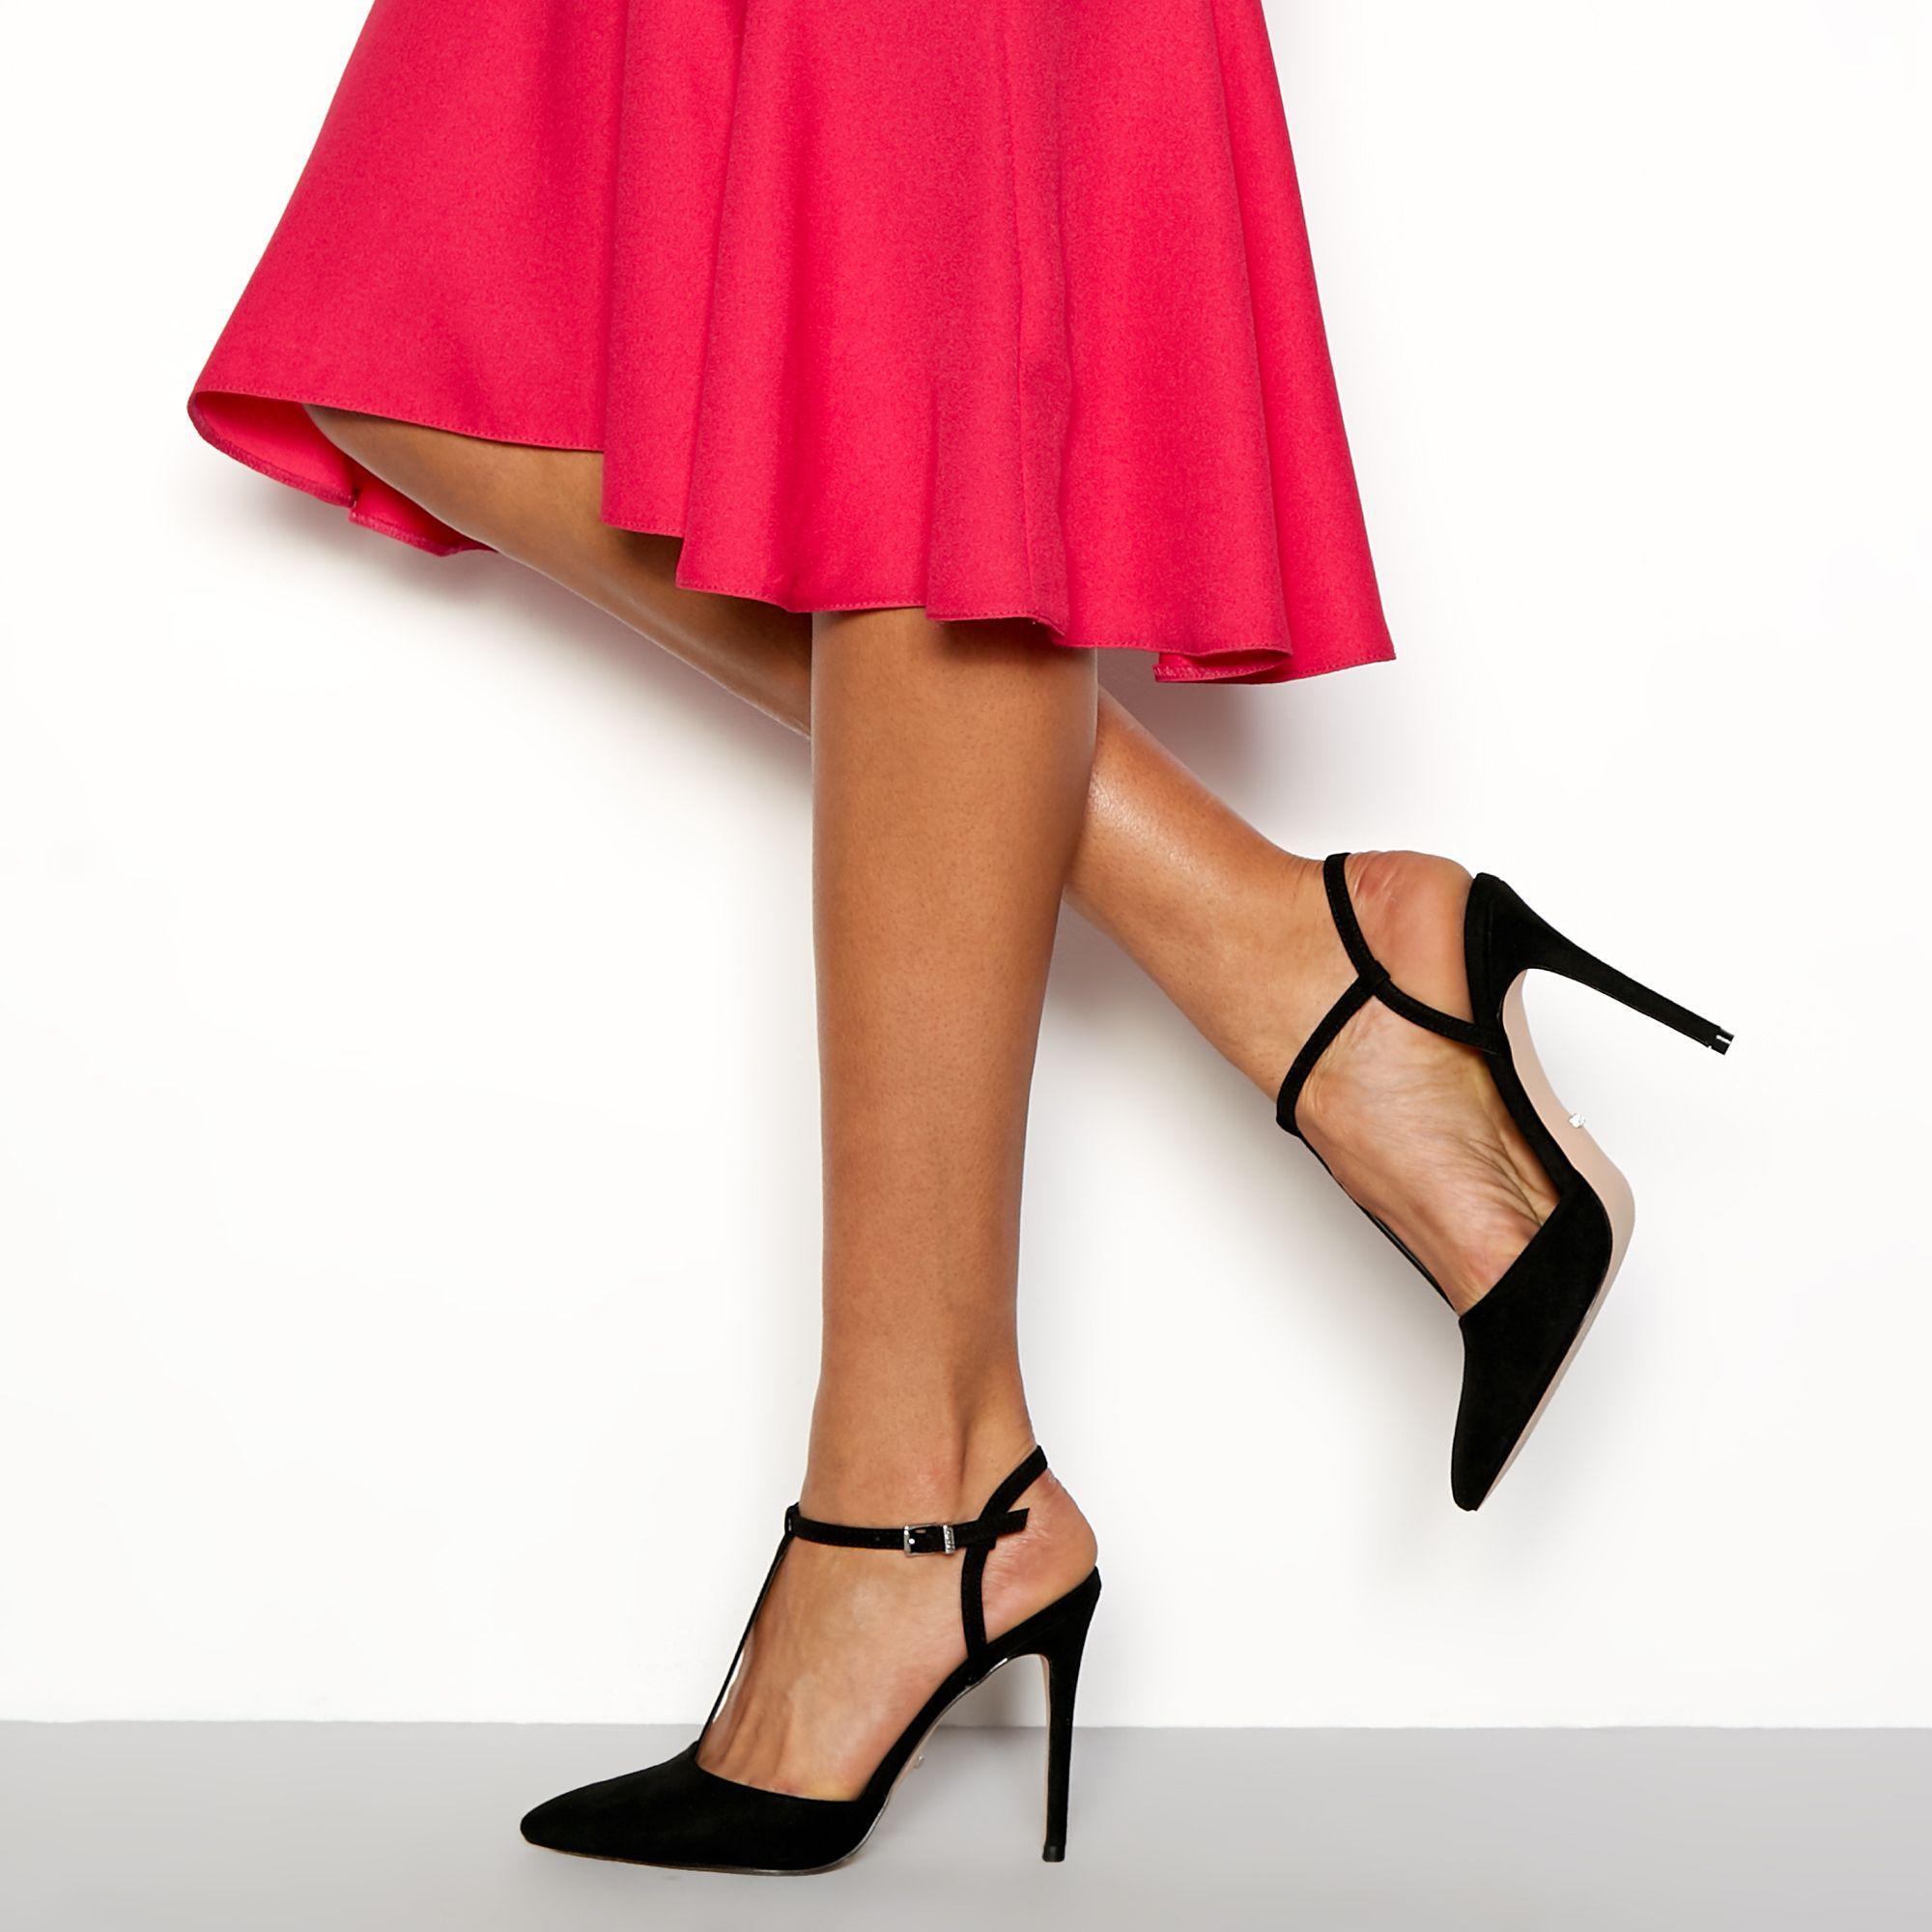 79fcd006d50 Faith Black  chi  T-bar Stiletto Heels Sandals in Black - Lyst